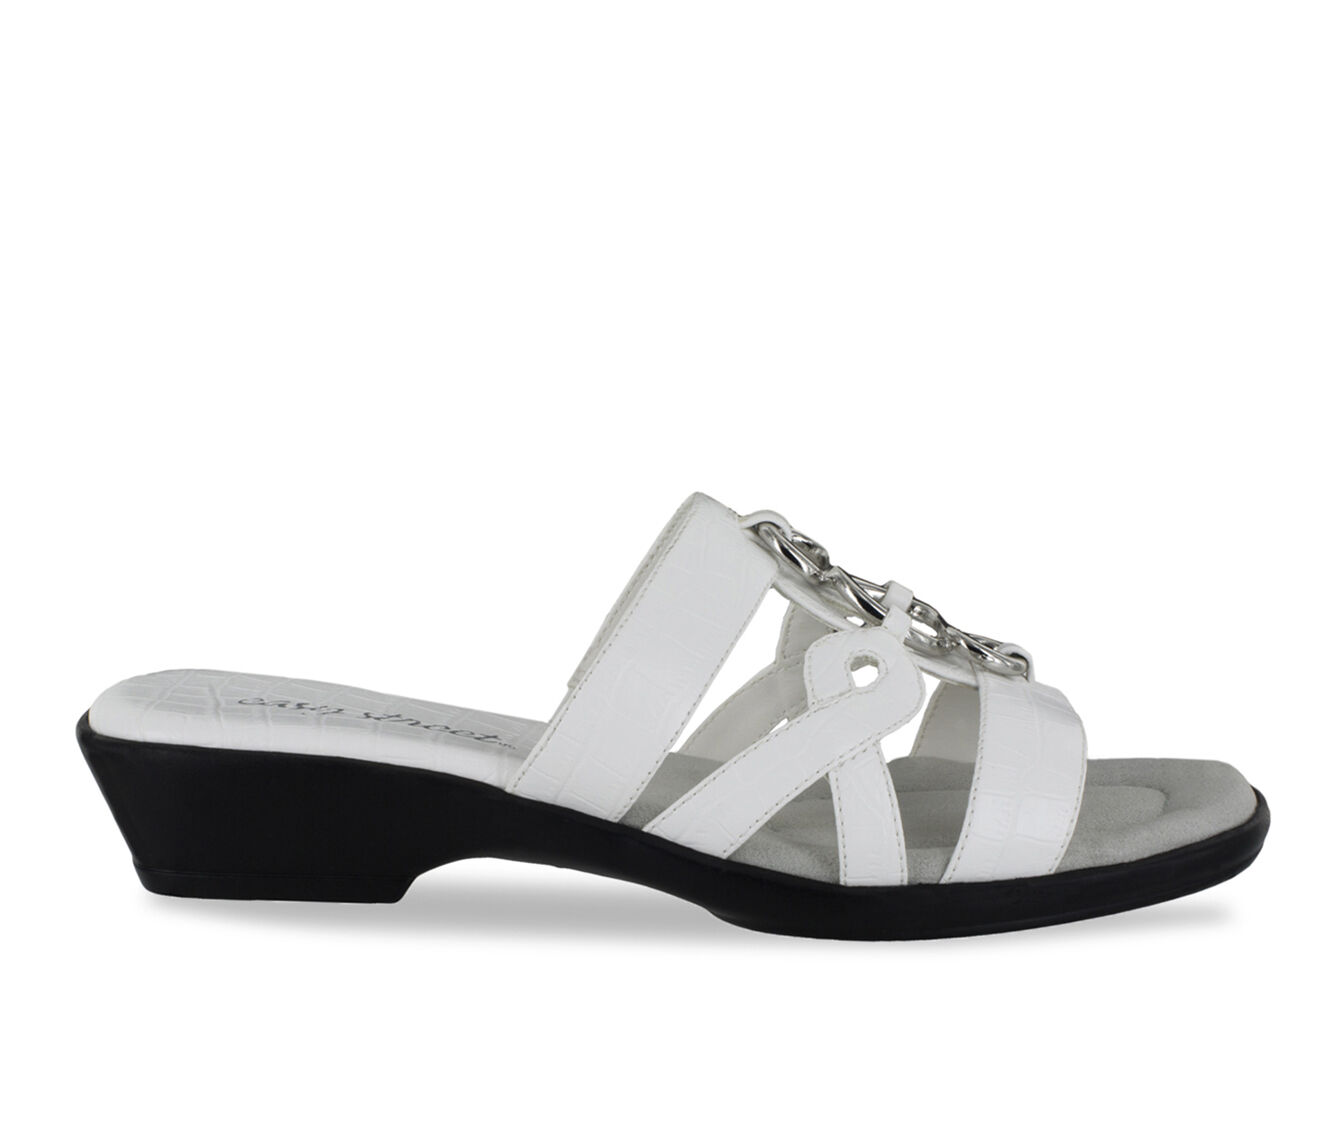 Women's Easy Street Torrid Sandals White Croco